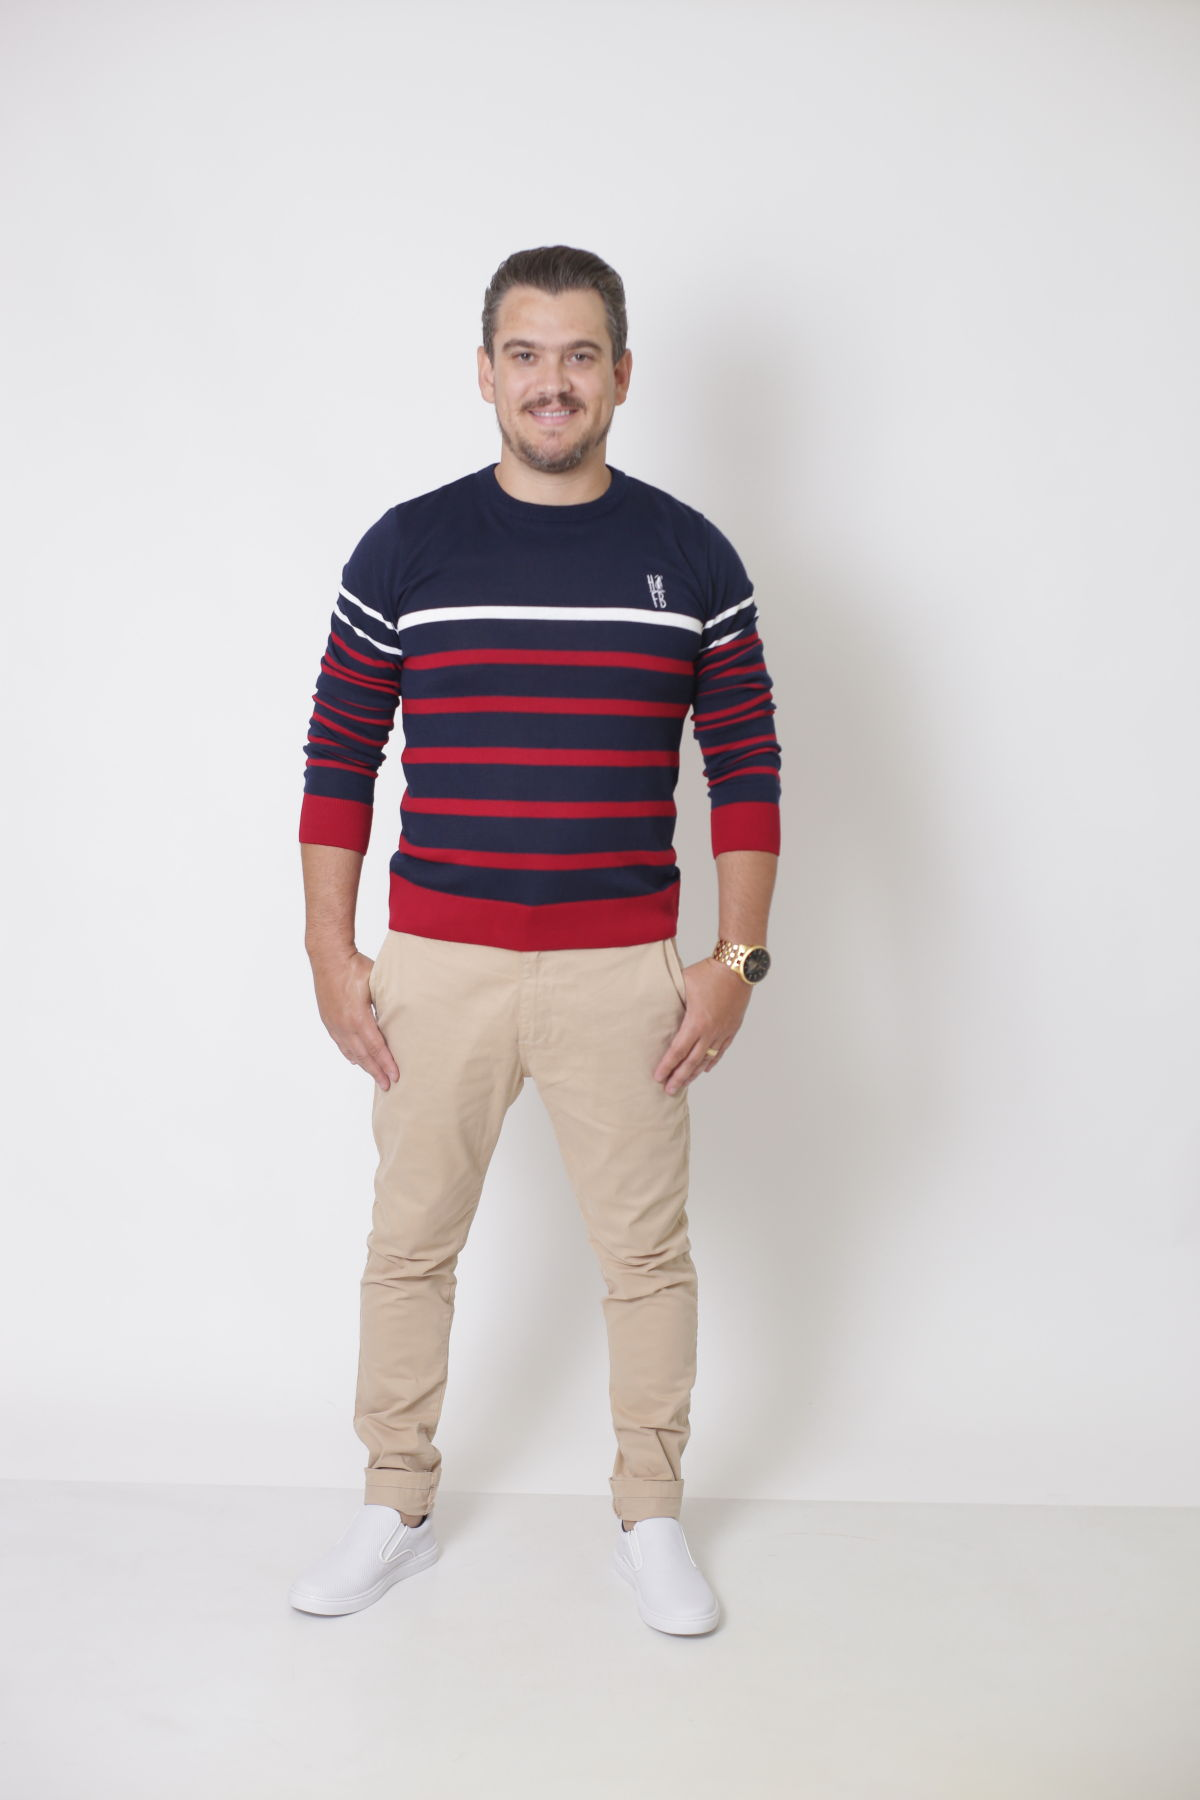 Blusa Suéter Listrado Unissex Adulto  - Heitor Fashion Brazil